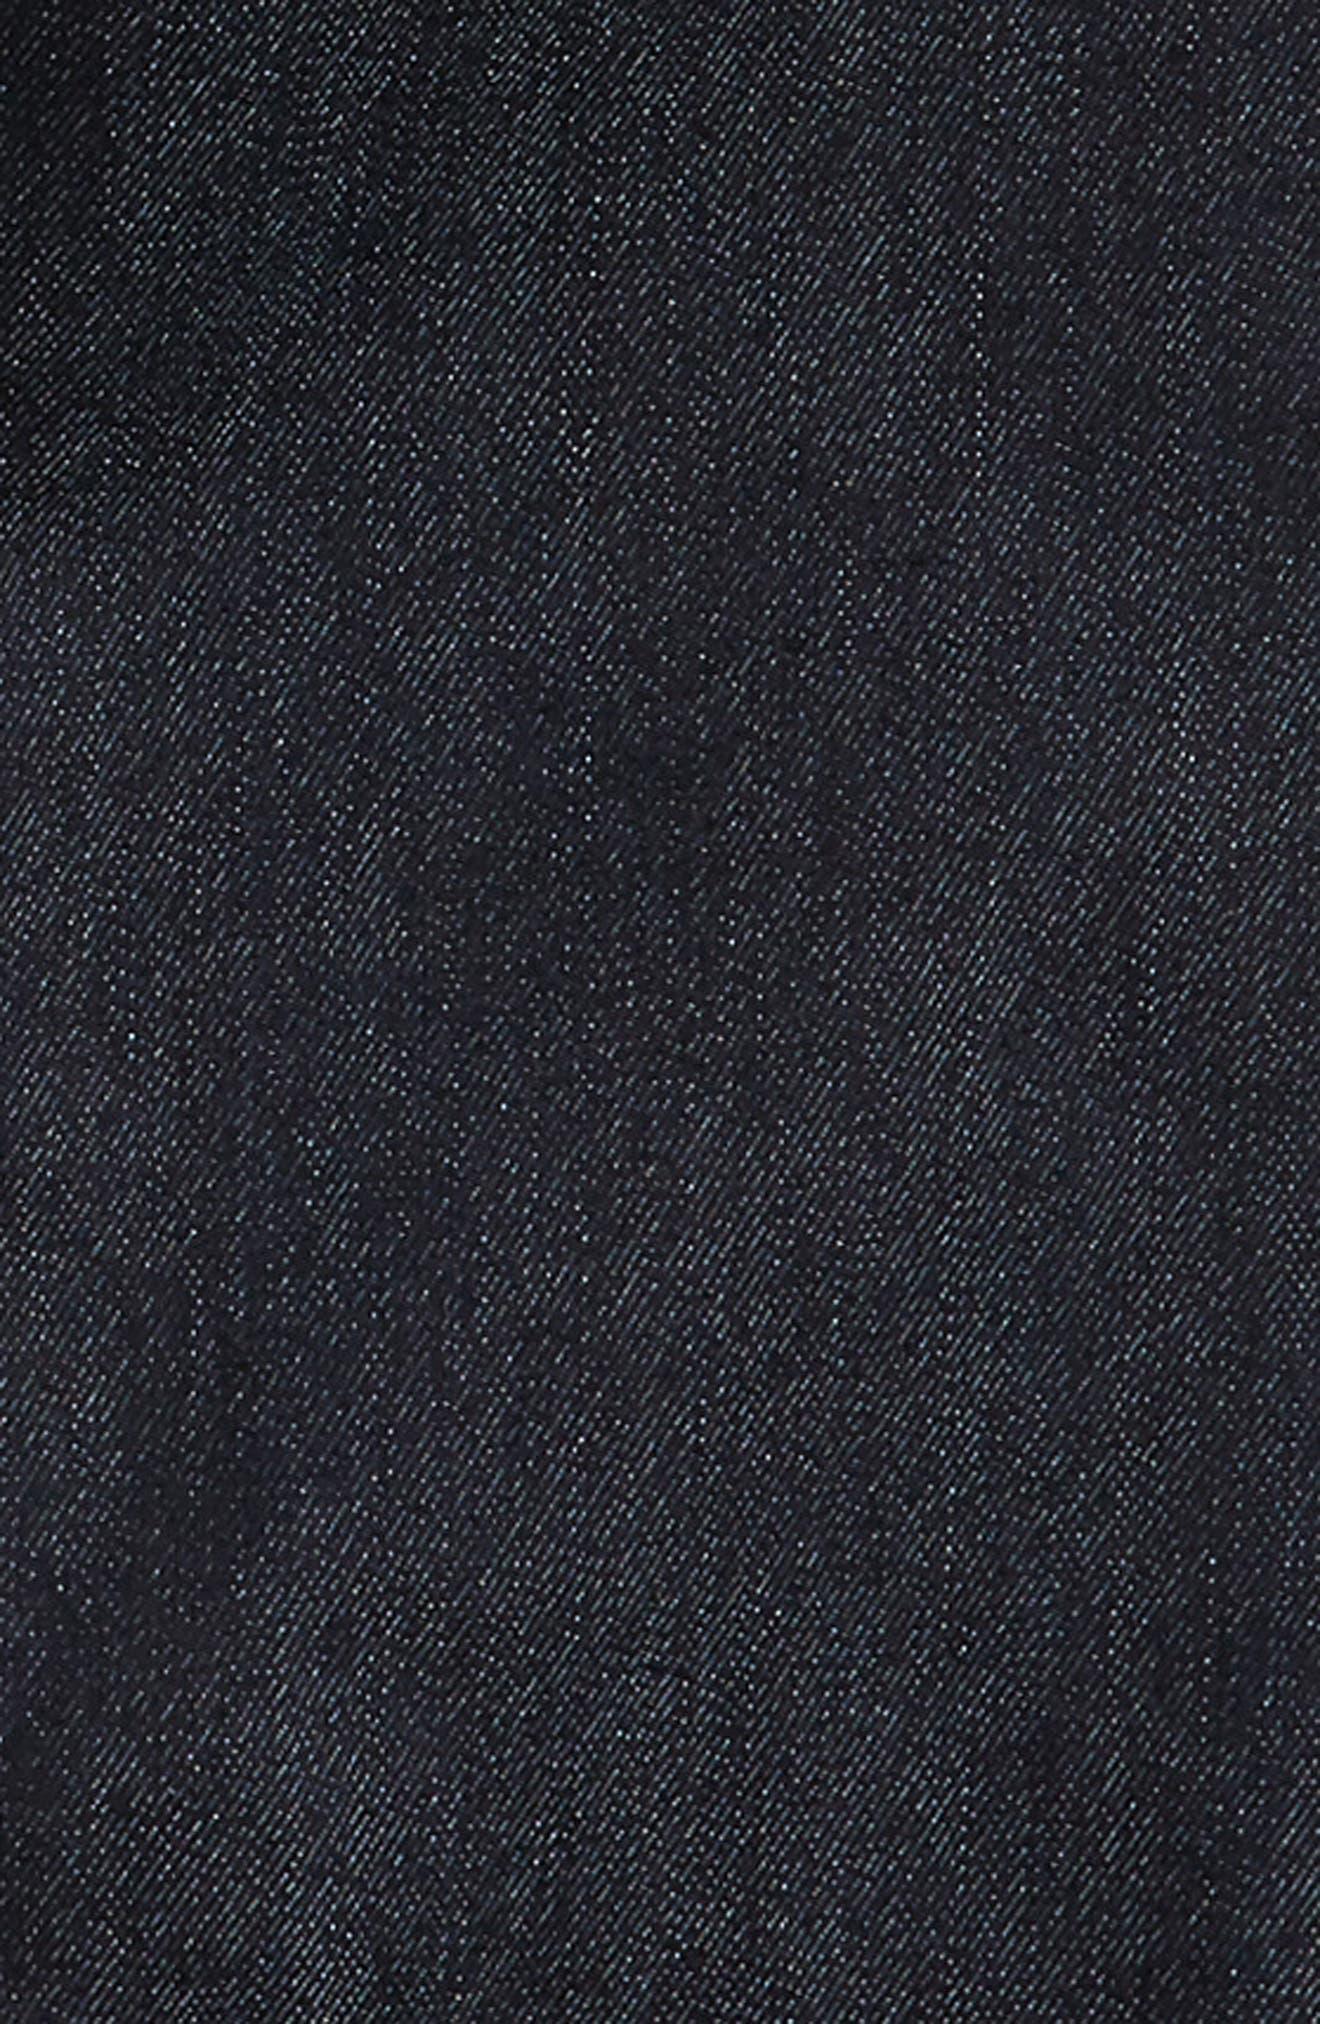 Brixton Straight Leg Jeans,                             Alternate thumbnail 3, color,                             400